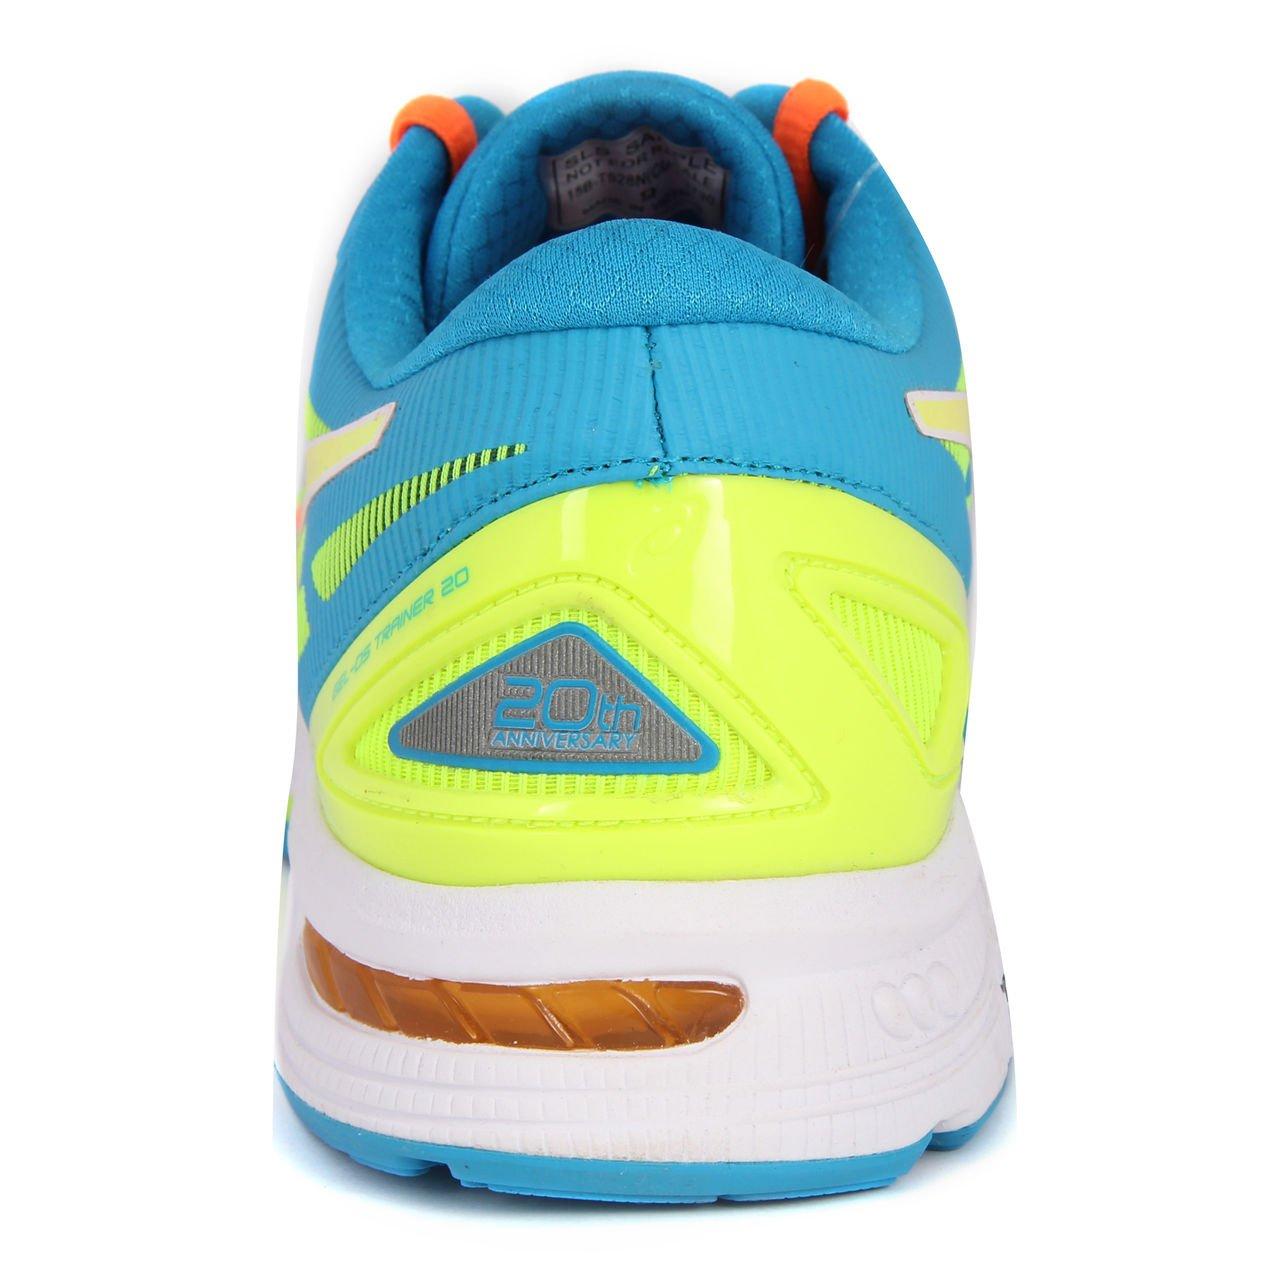 Buy ASICS Men's Gel Ds Trainer 20 Flash Yellow, Hot Orange